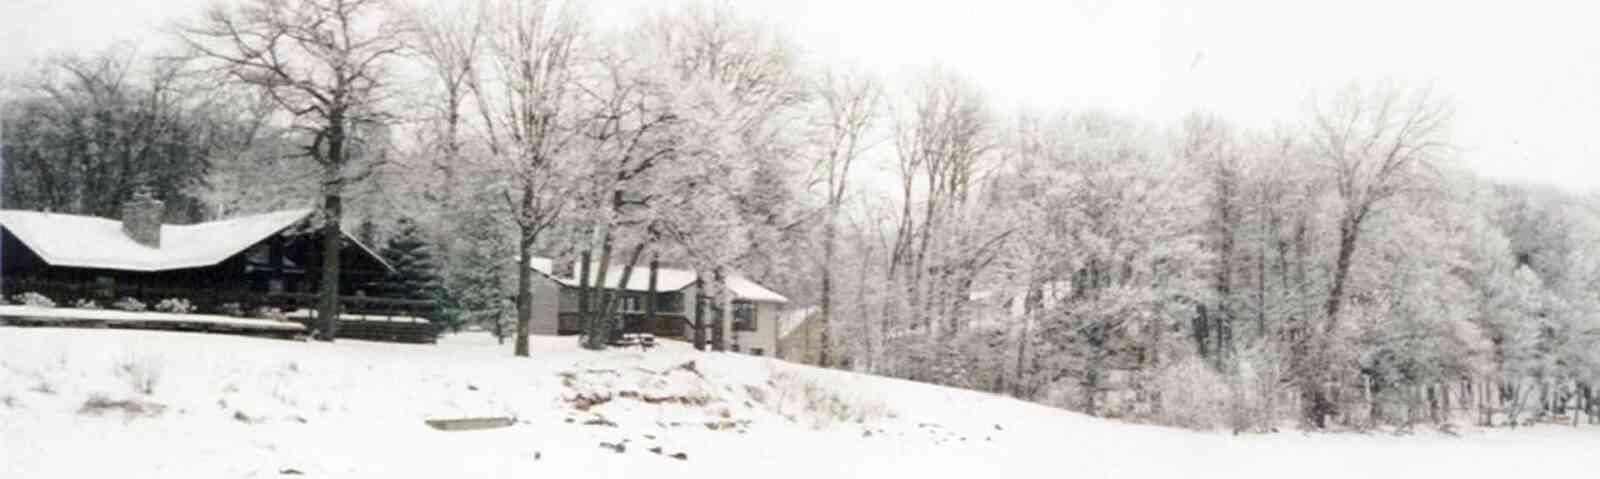 Plan a Winter Ice Fishing Adventure to Minnesota at Adventure North Resort in Walker